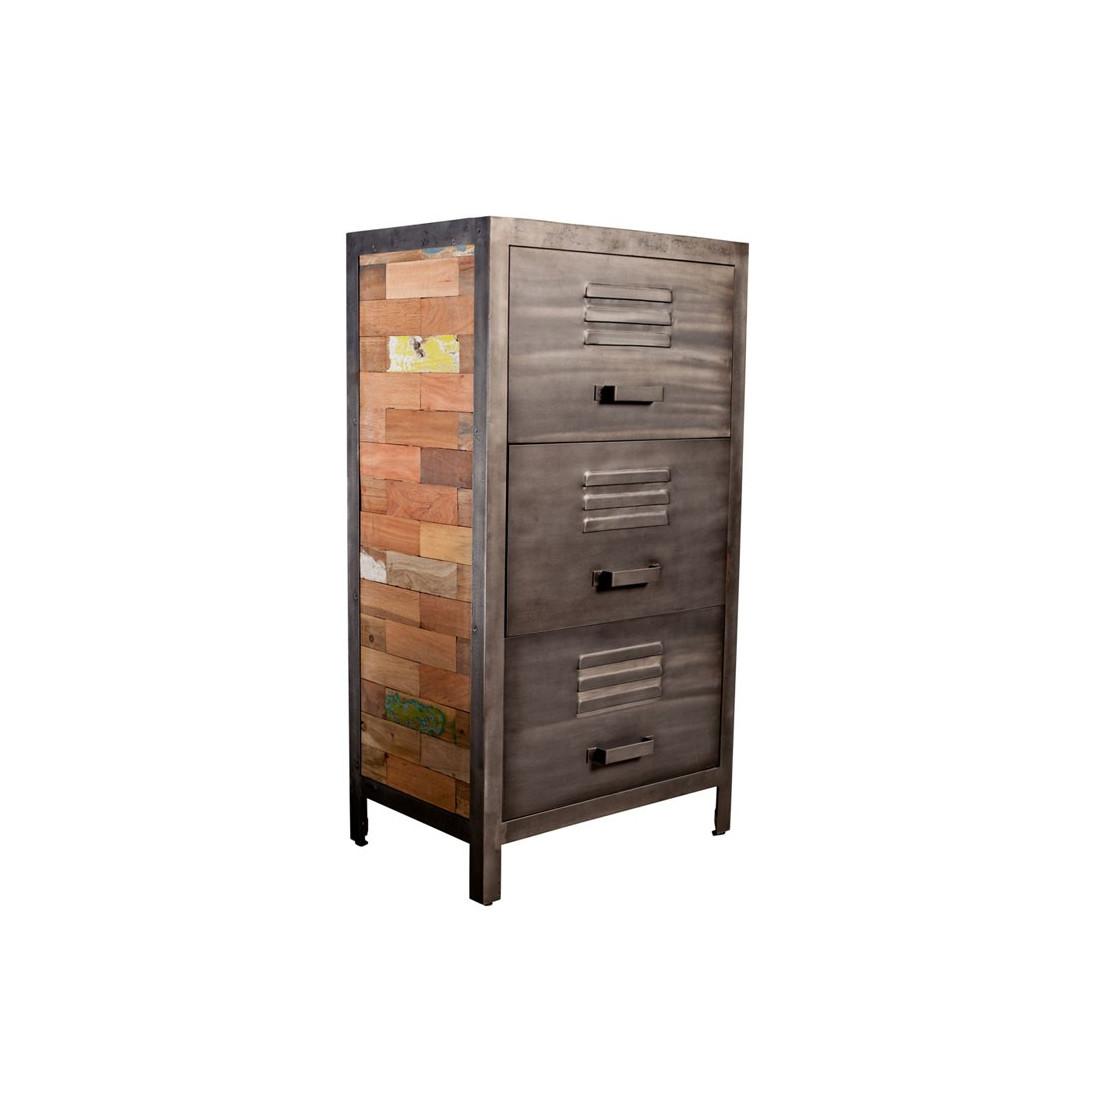 Chiffonnier bois 3 tiroirs fabrik univers des petits meubles for Meuble a petits tiroirs